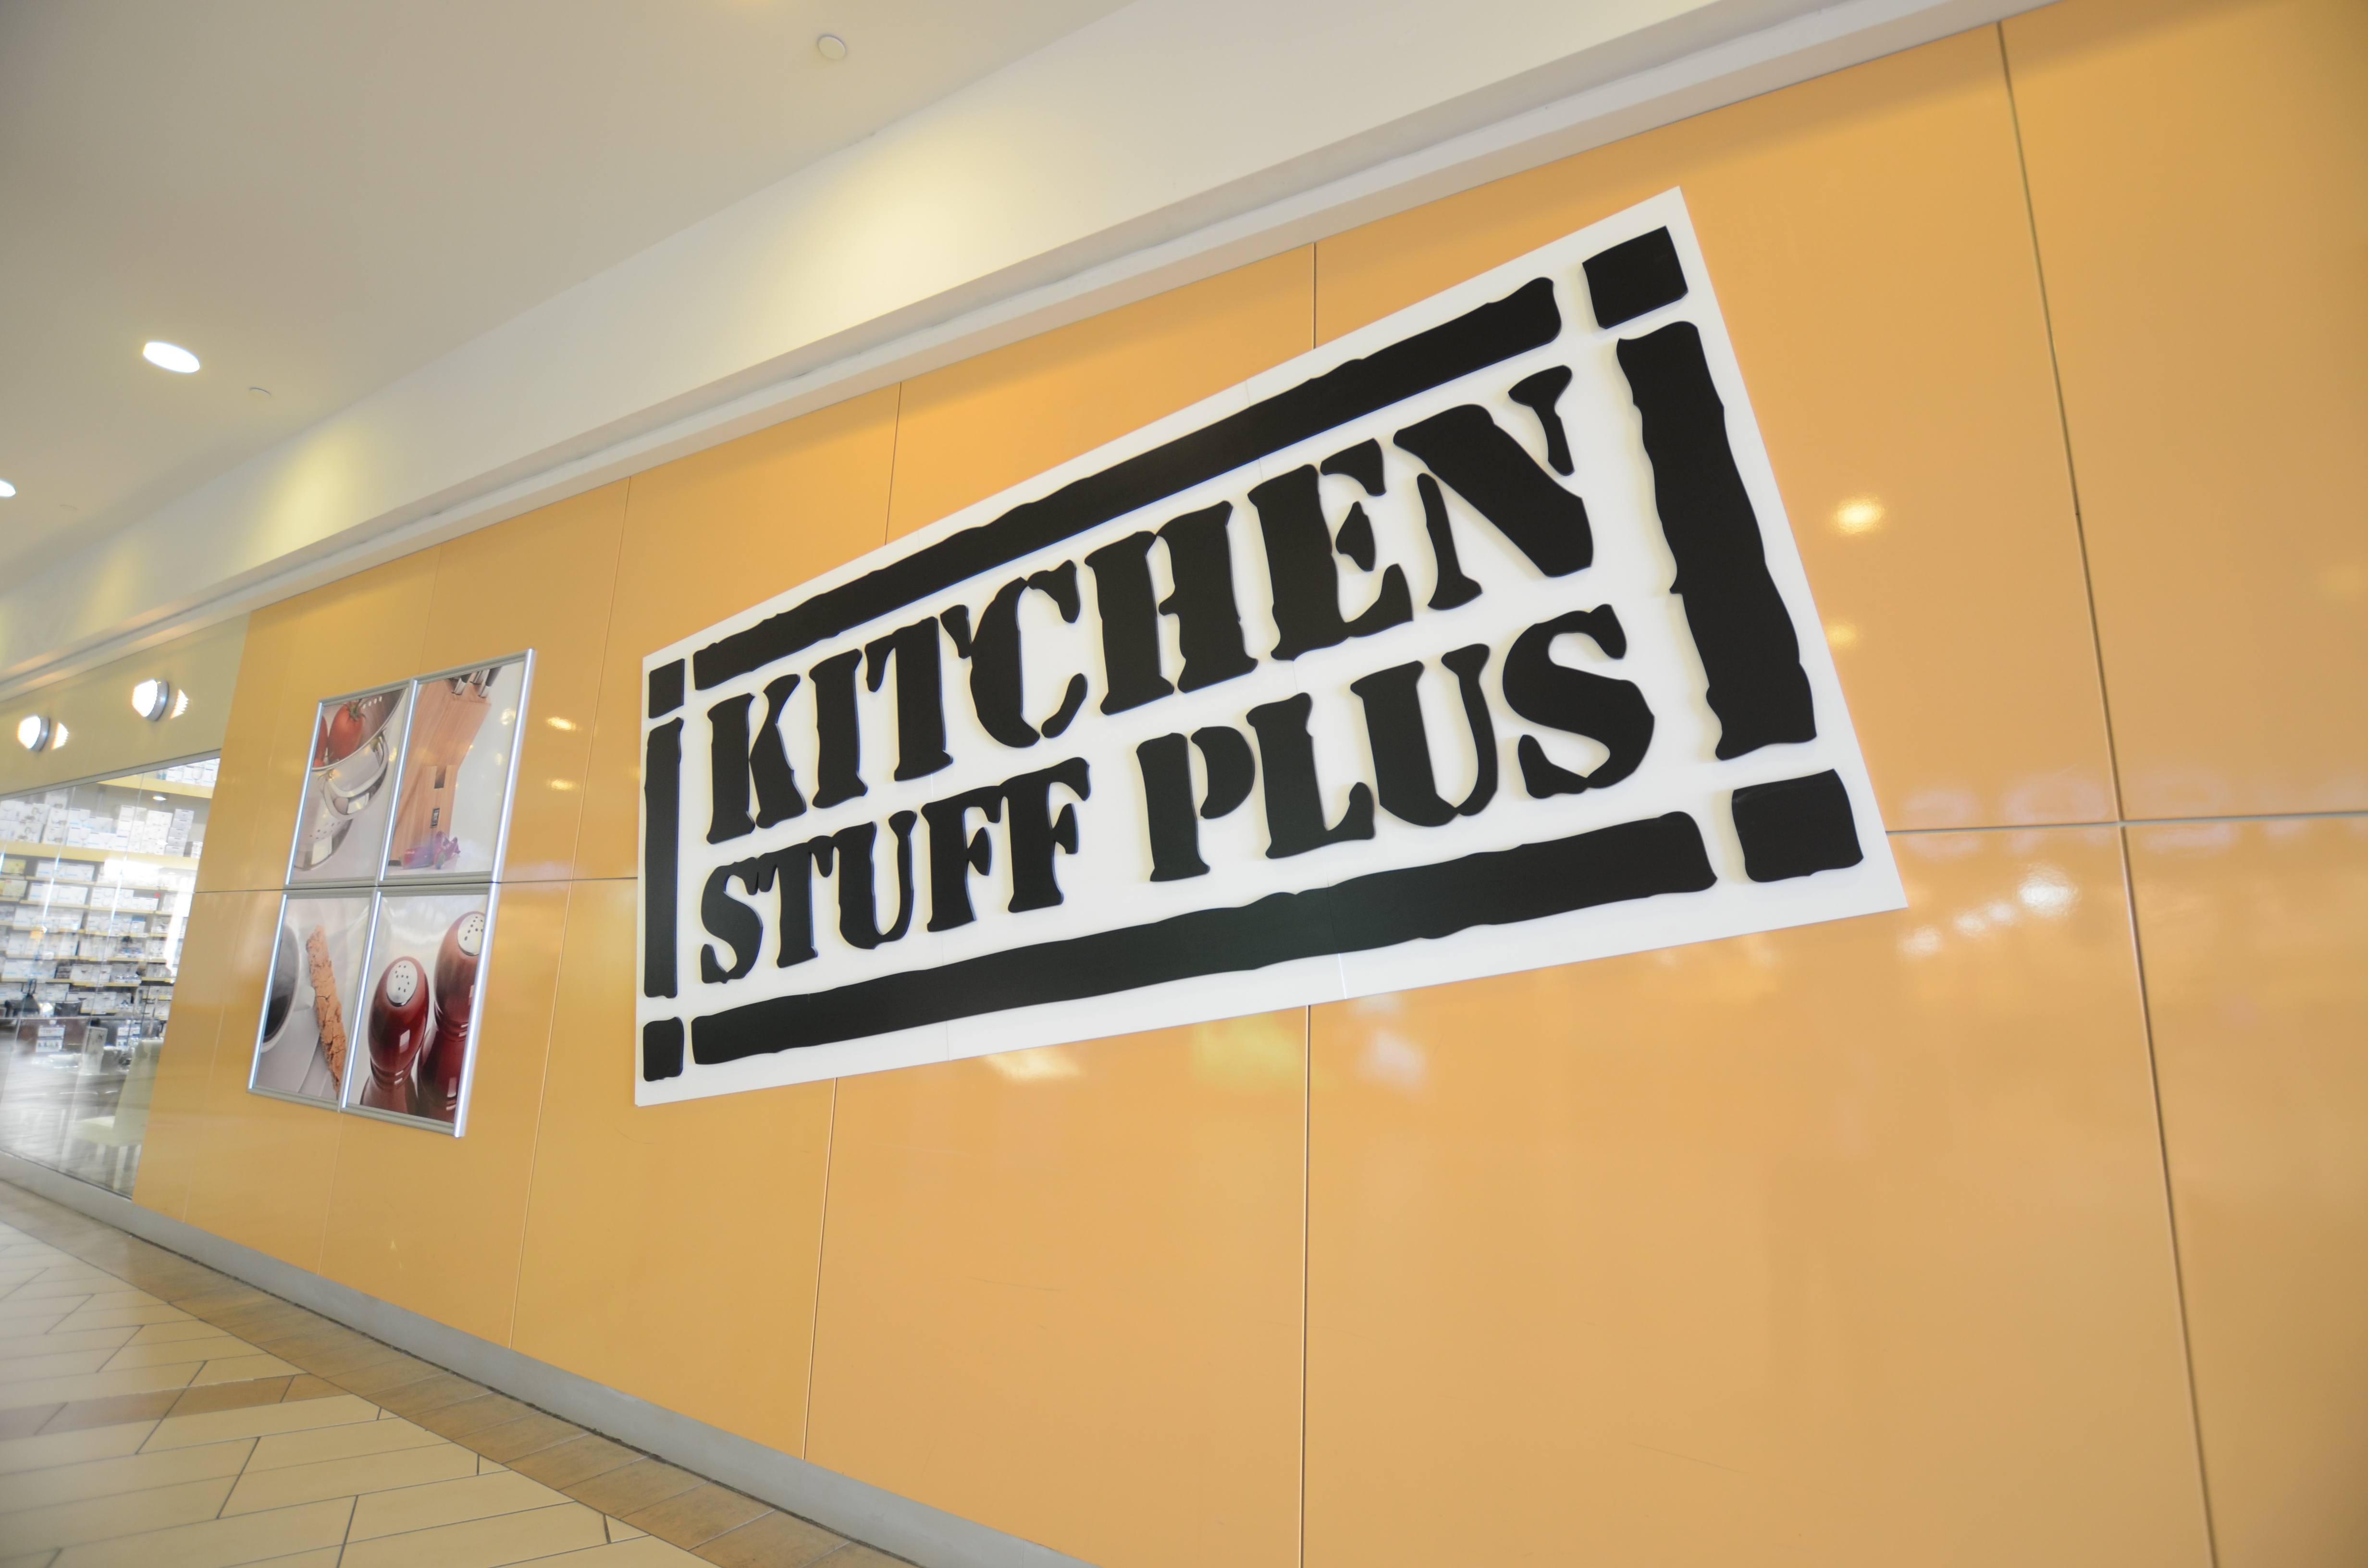 Kitchen Stuff Plus Store Sign canadian